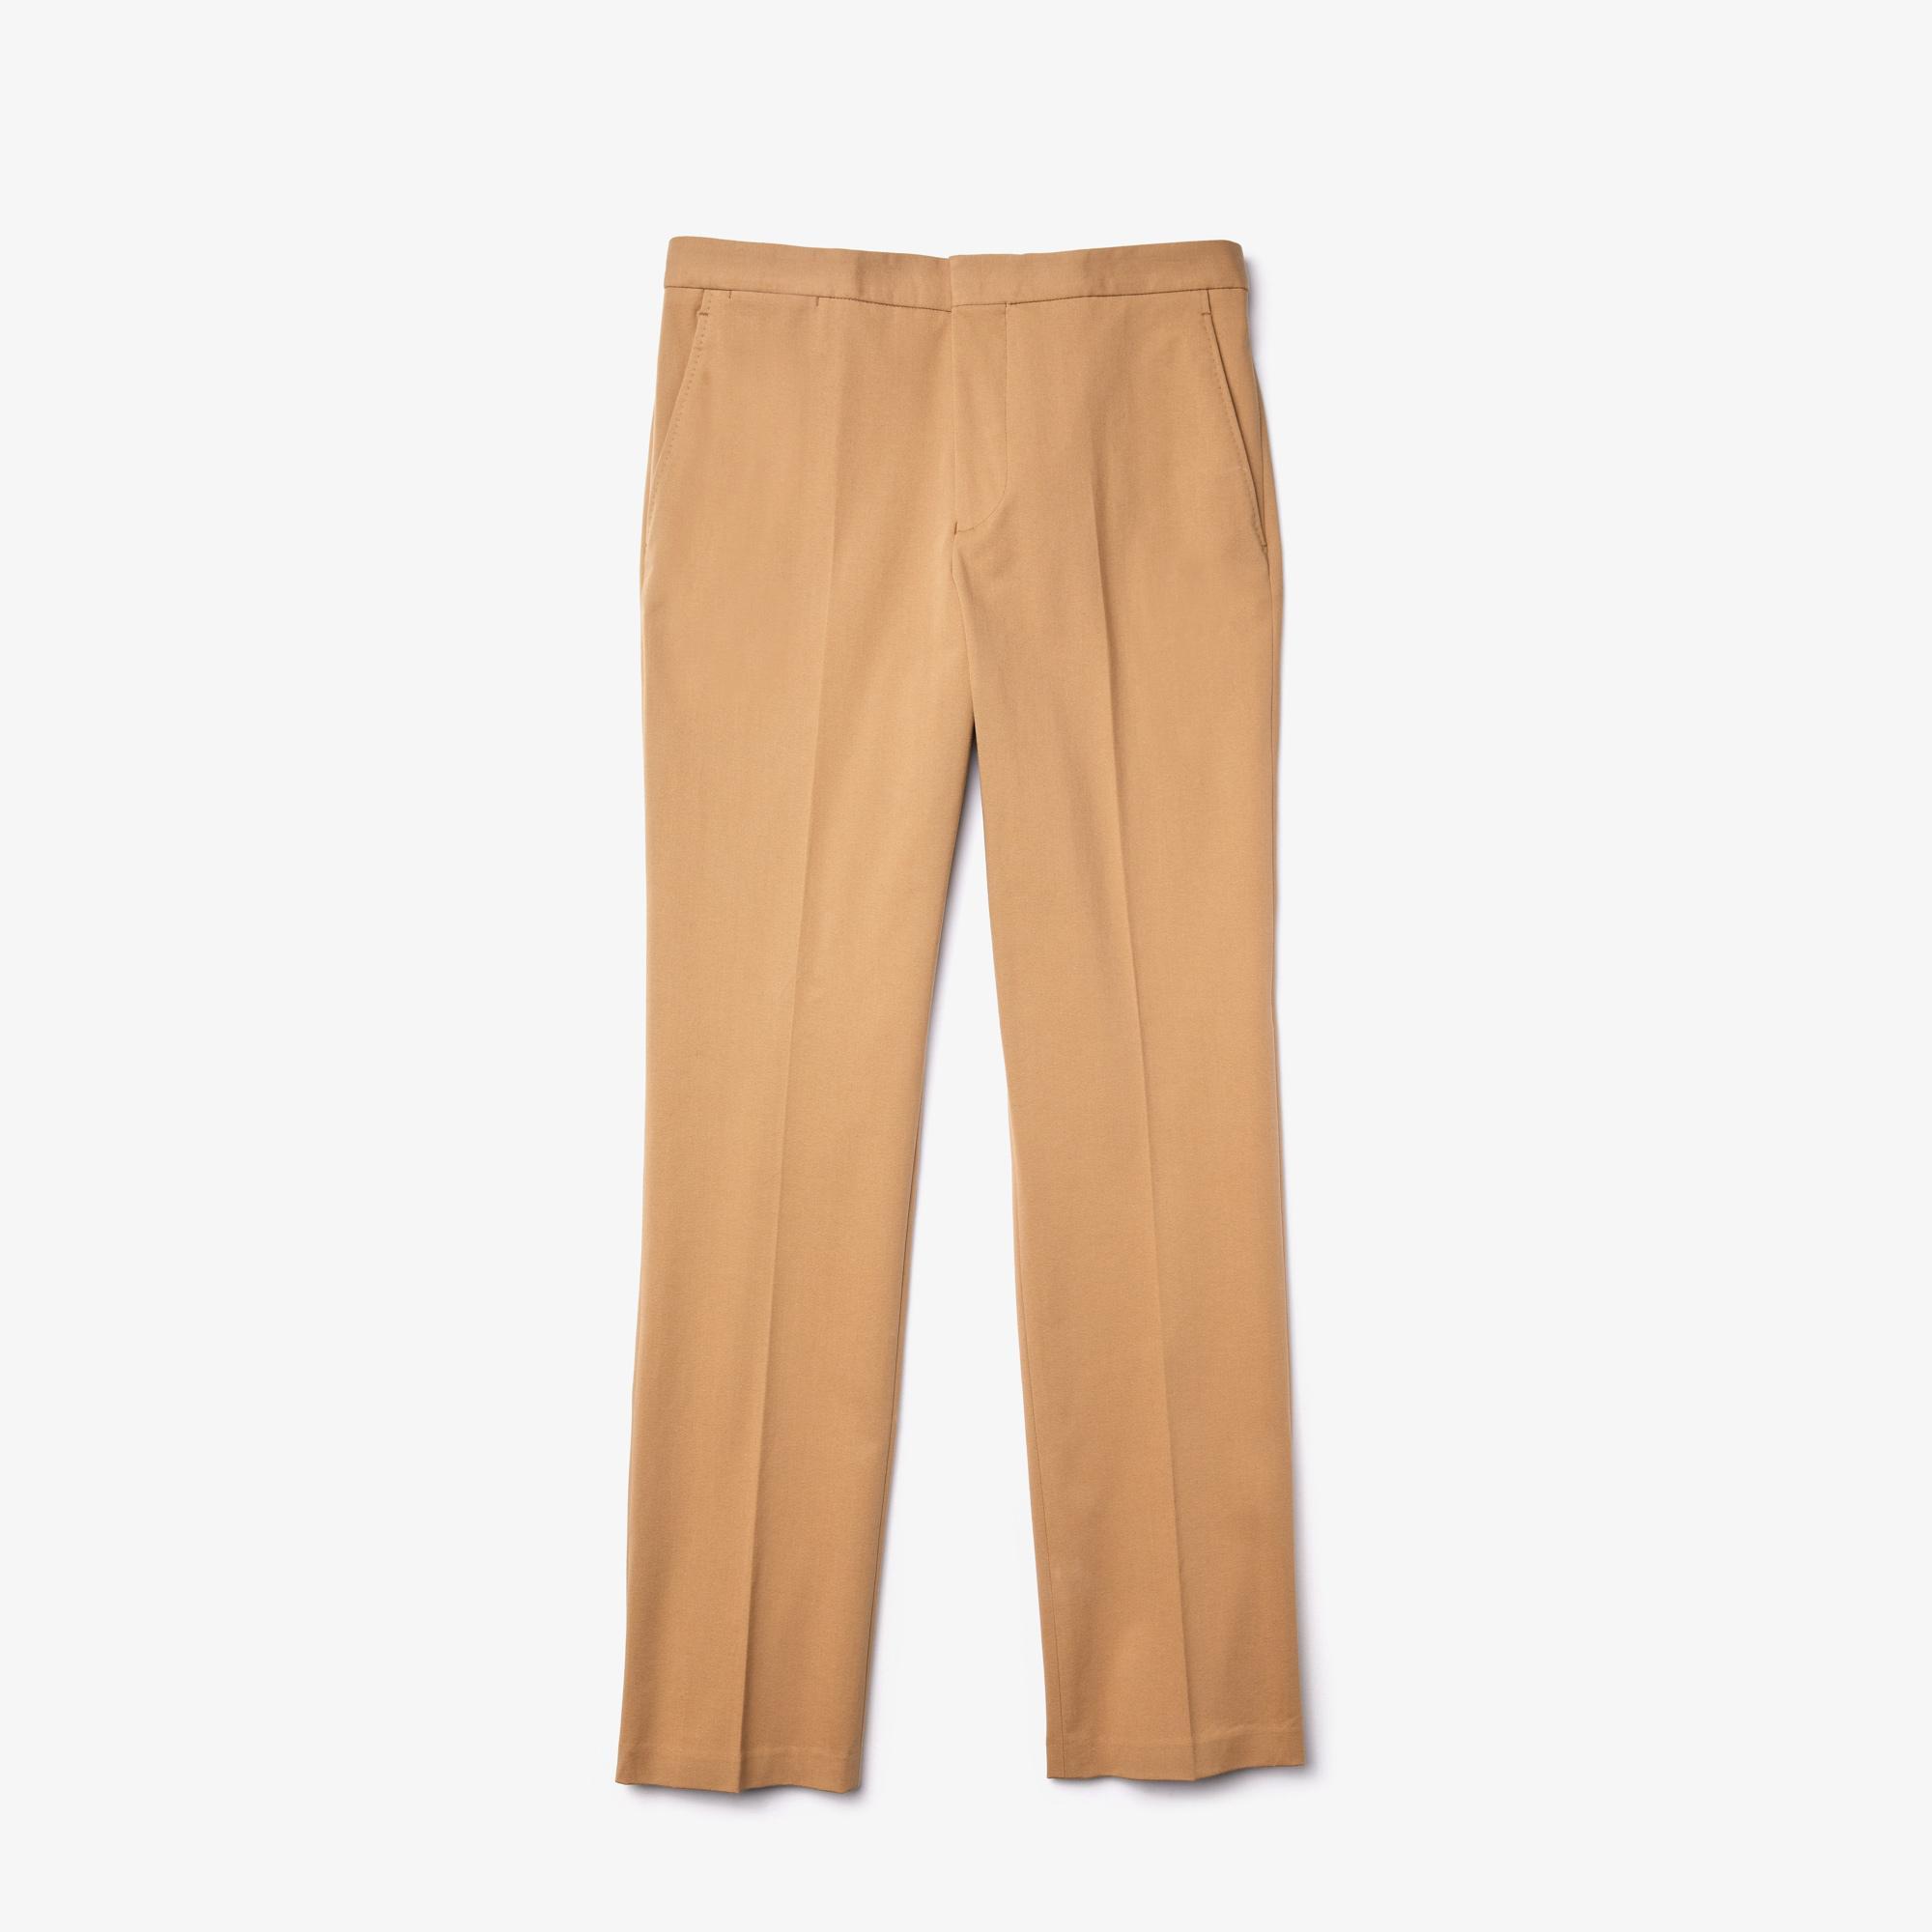 Lacoste Erkek Slim Fit Streç Kahverengi Pantolon